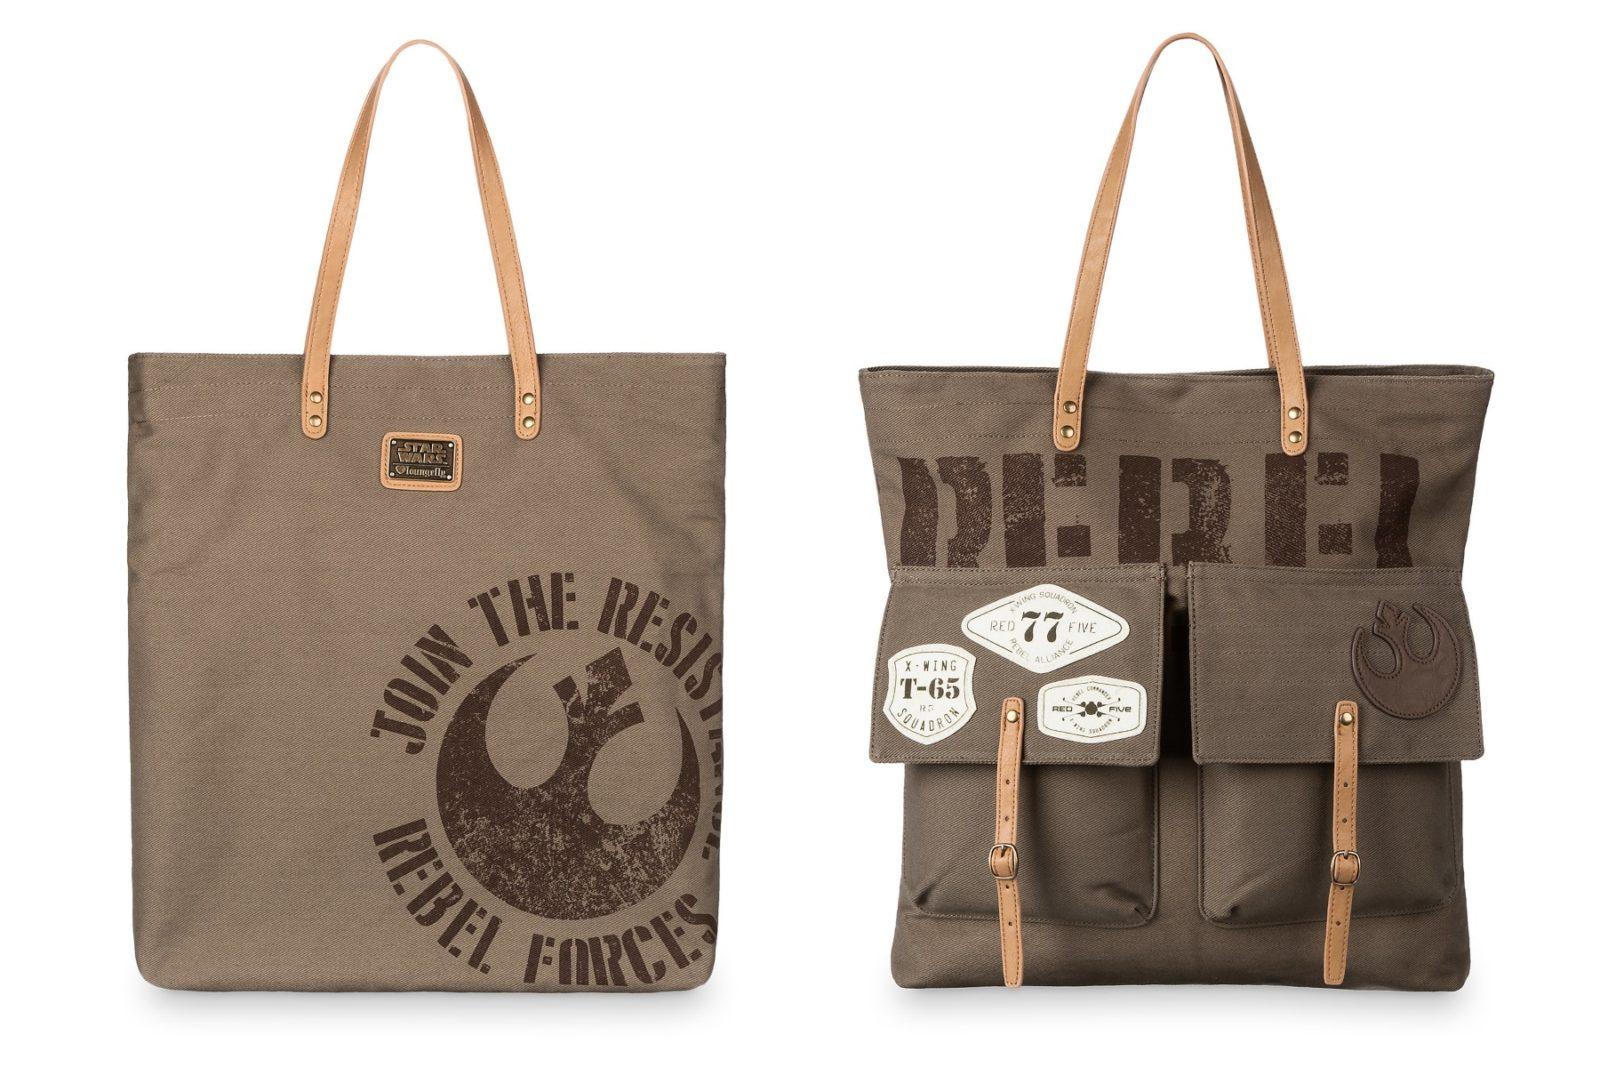 Loungefly Rebel Tote Bag at Shop Disney